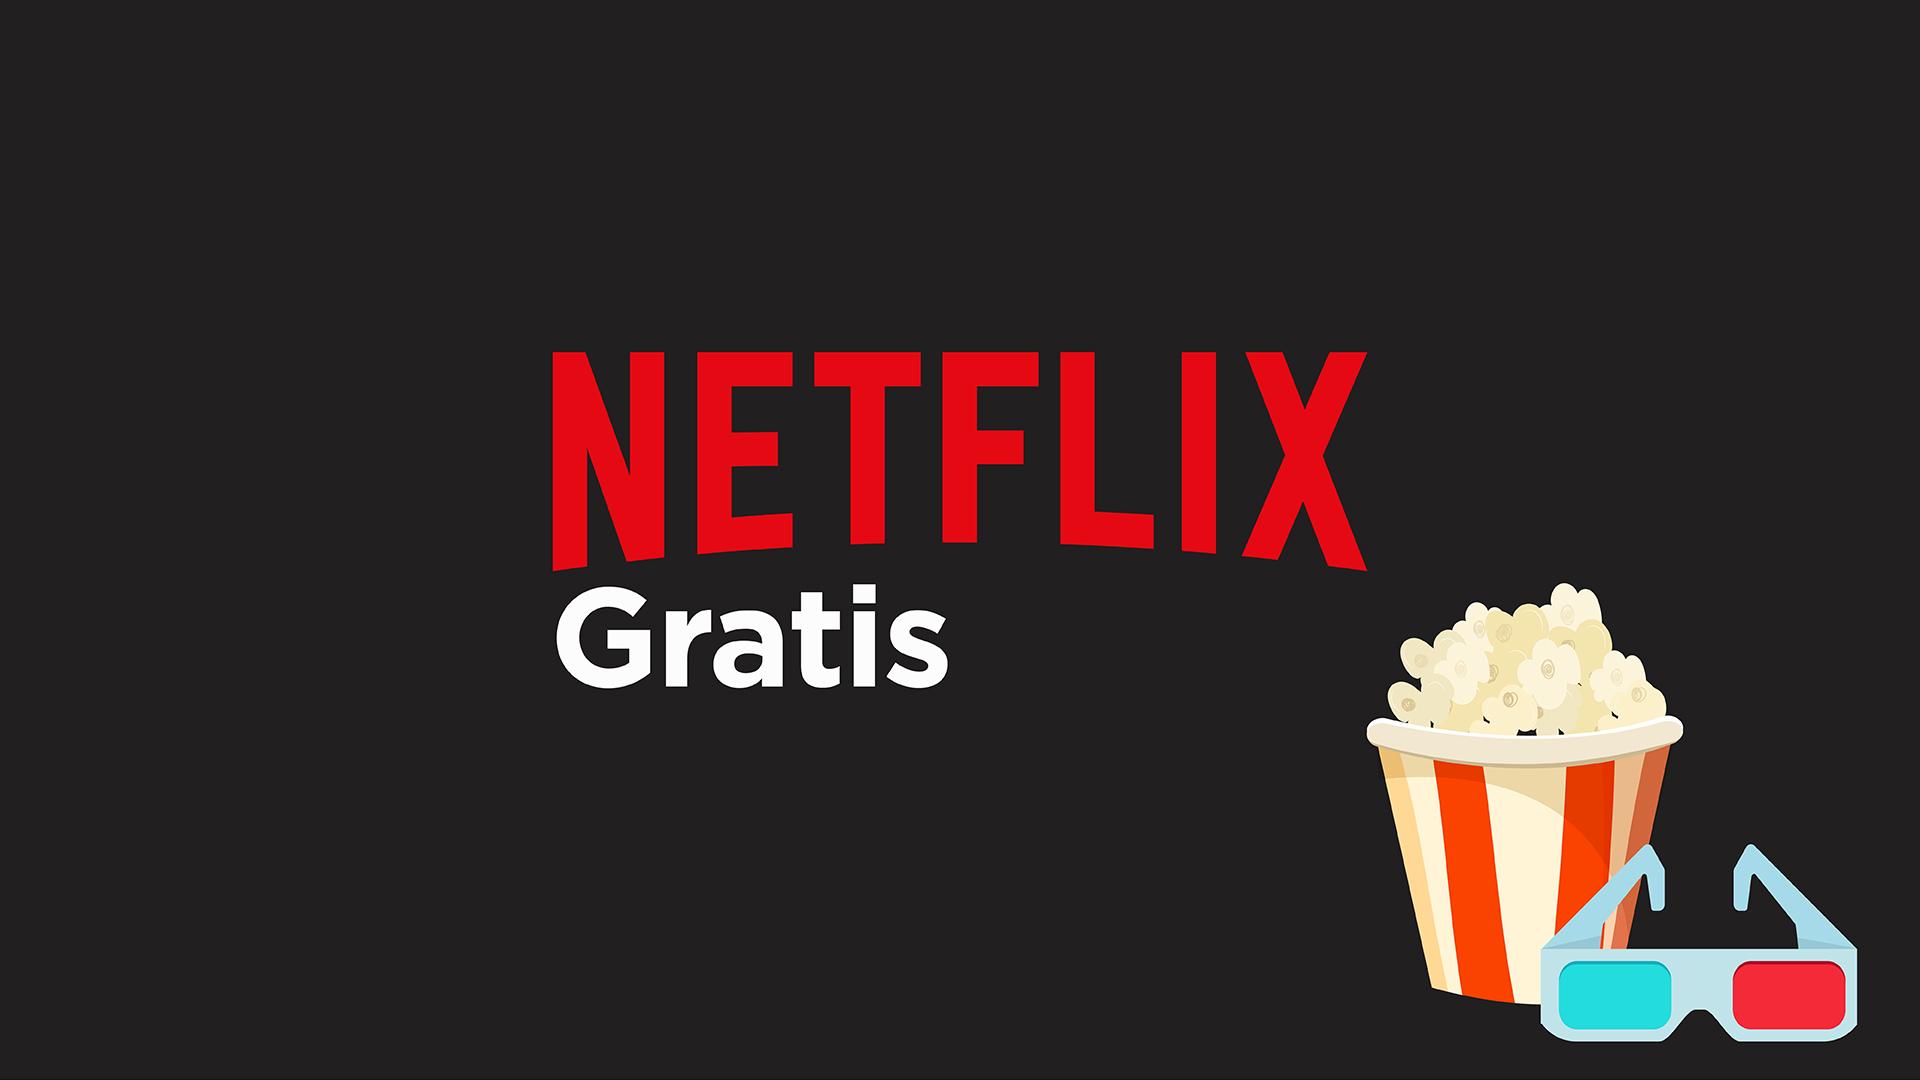 netflix gratis 2